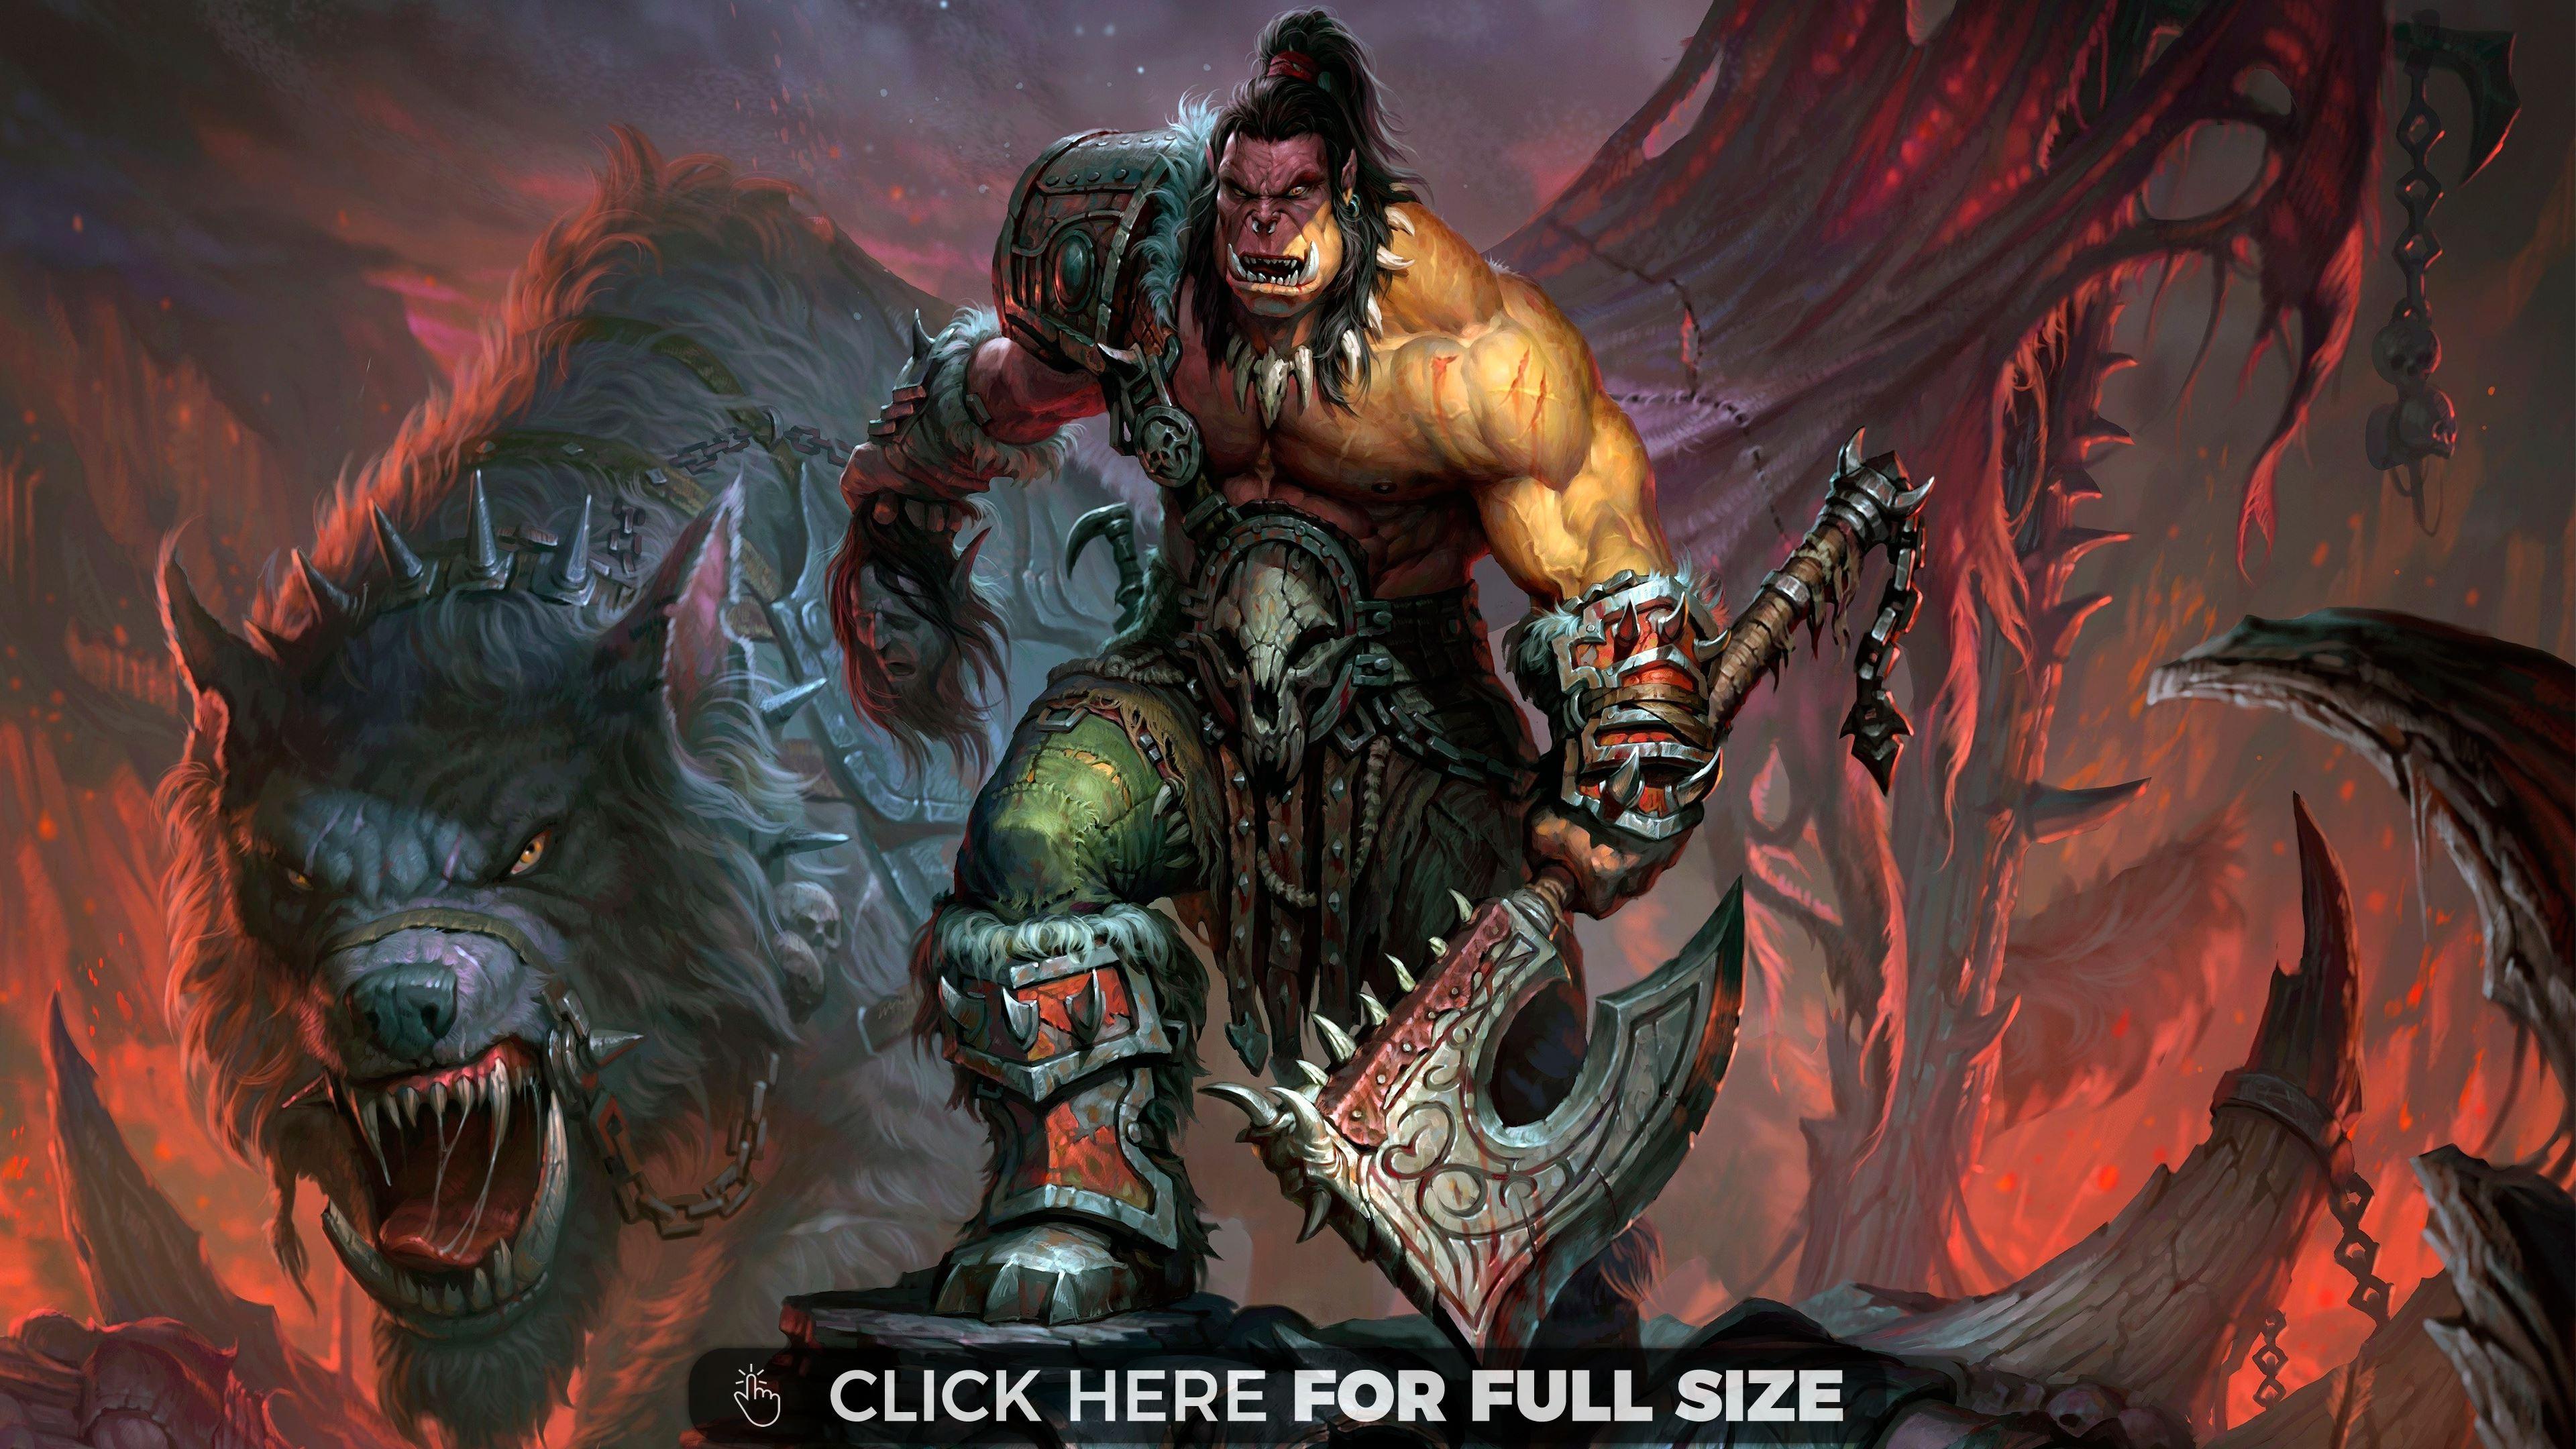 World of Warcraft Orc 4K 4K wallpaper 3840x2160